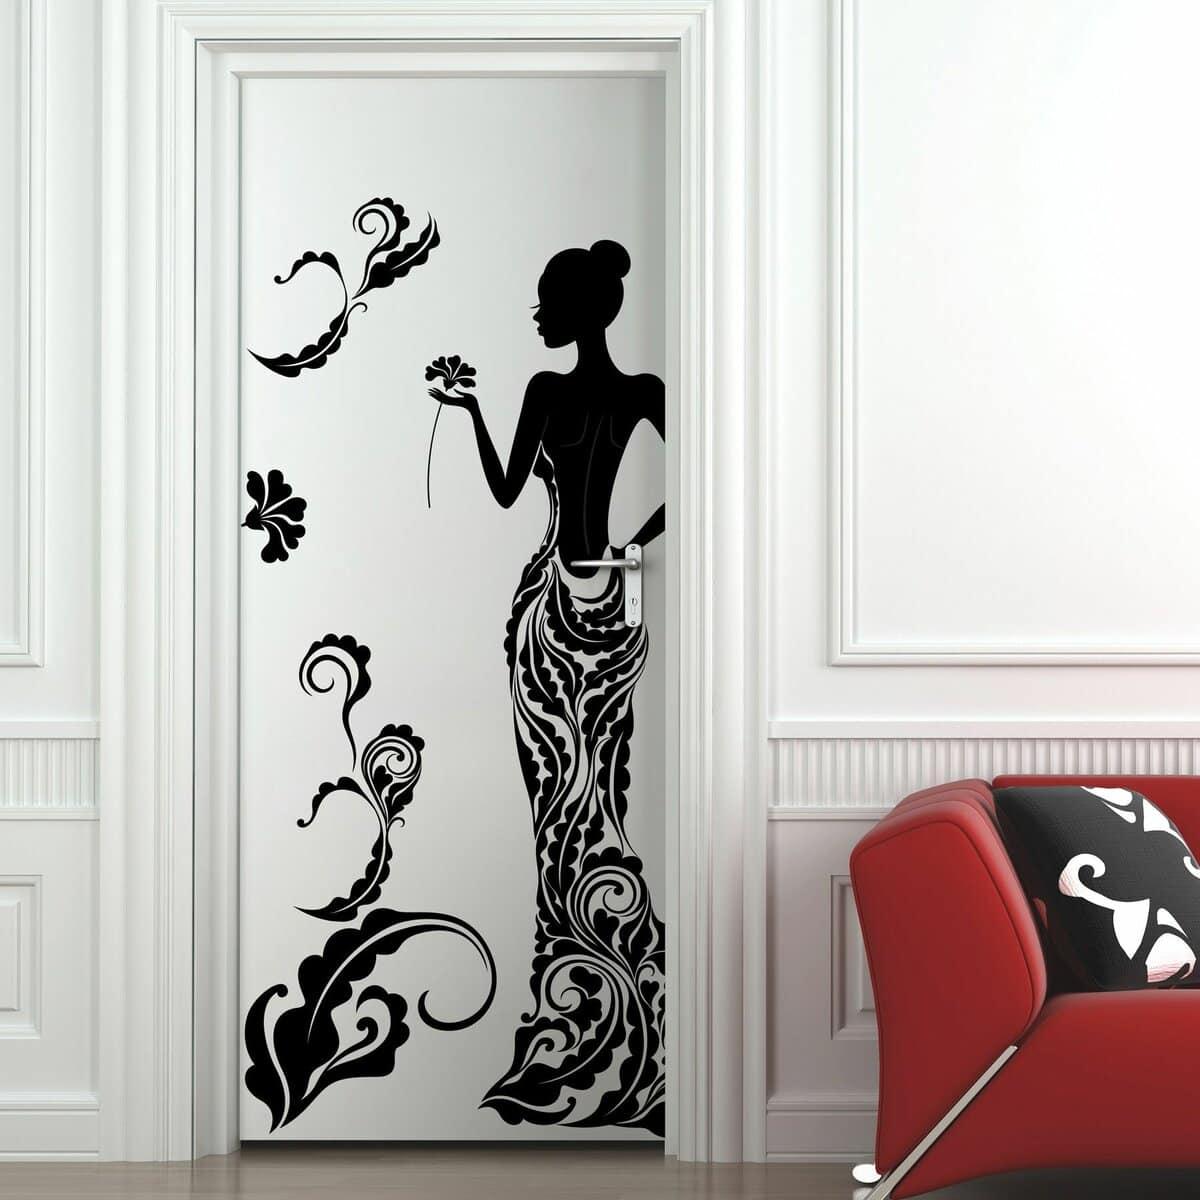 декор двери с помощью трафарета